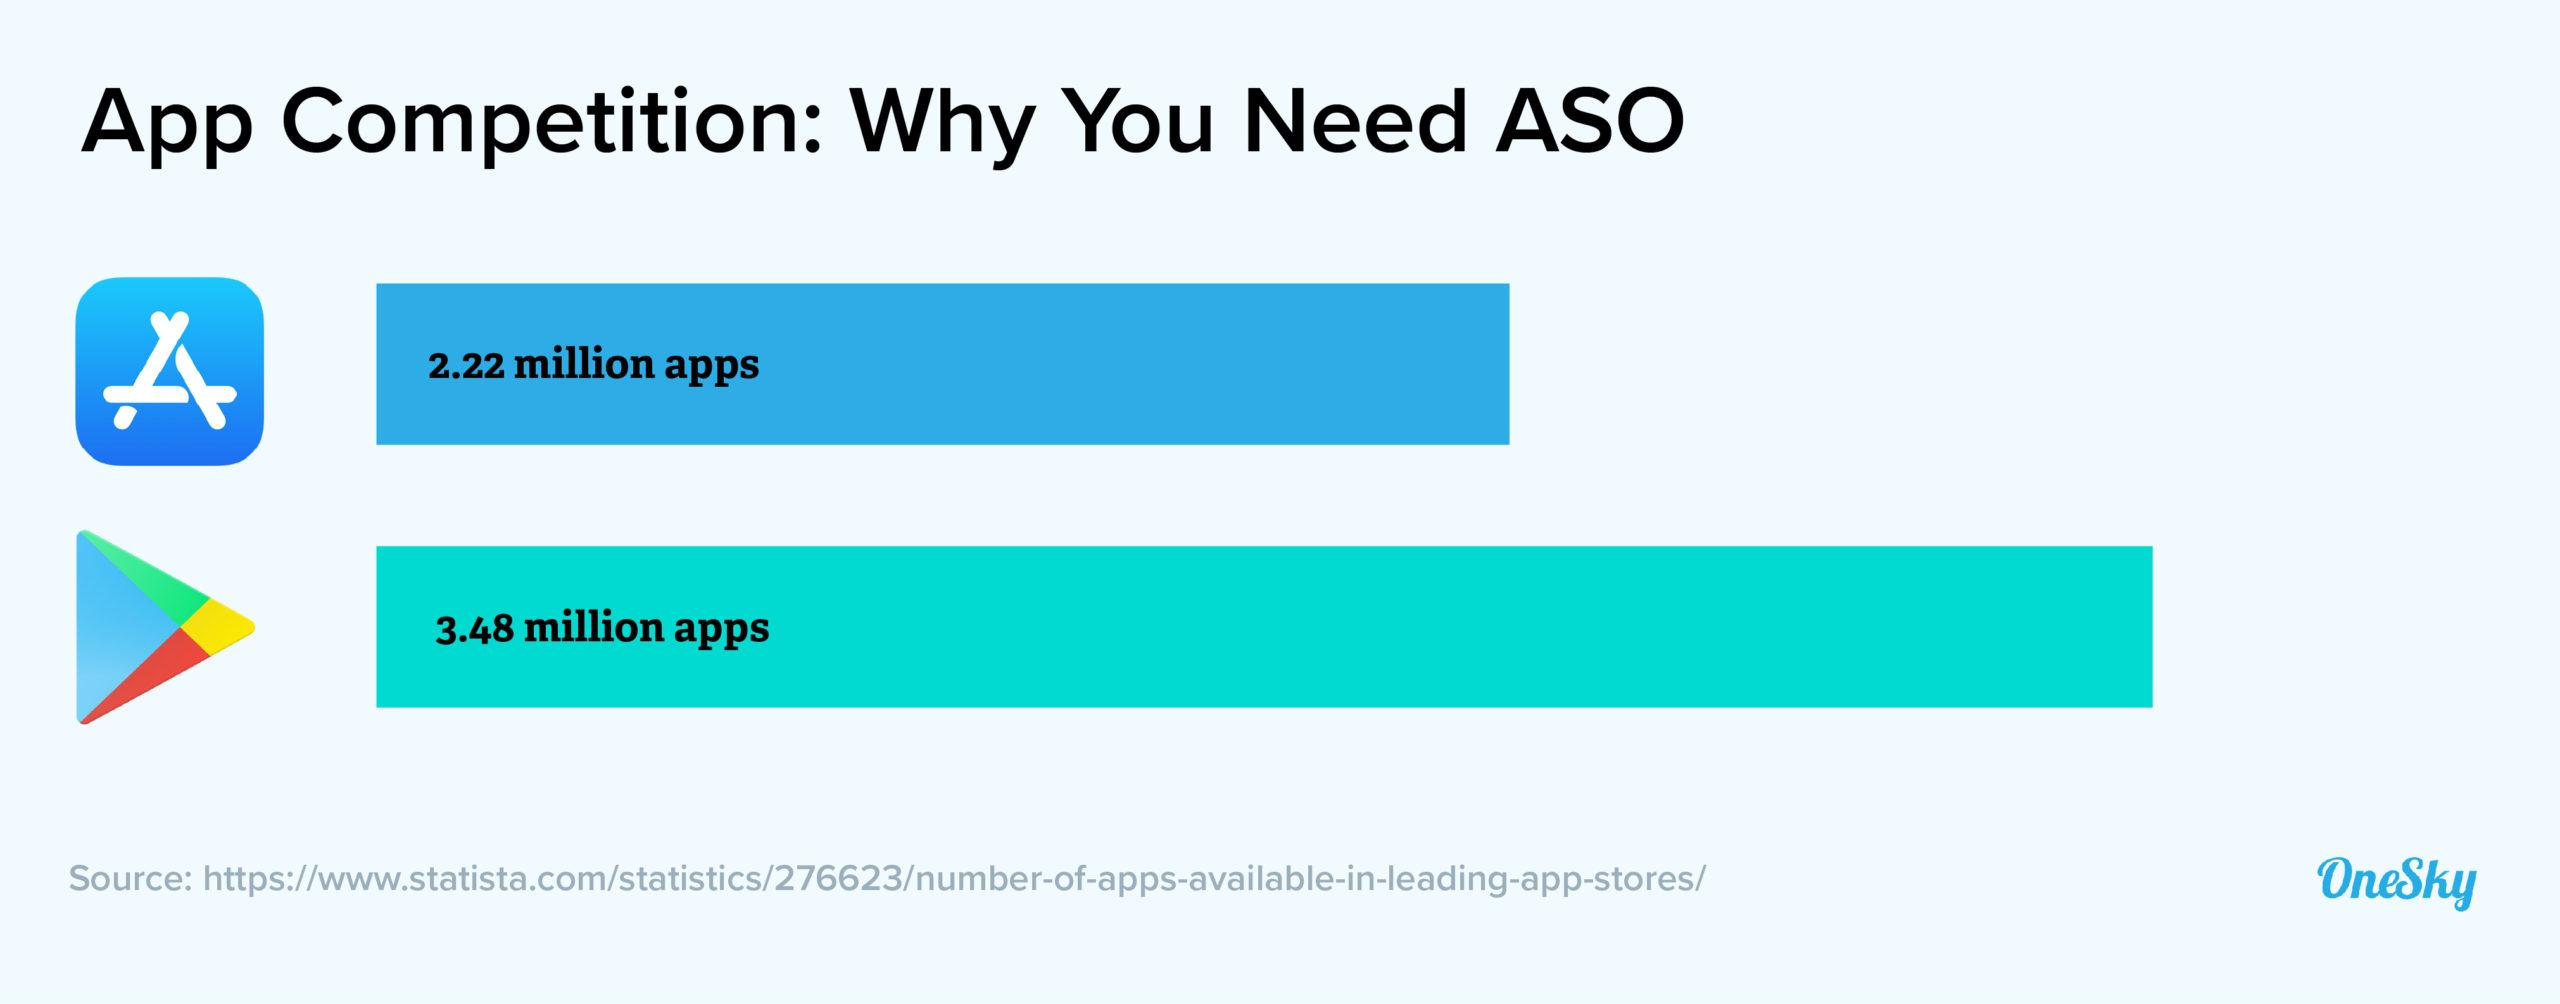 app competition statistics